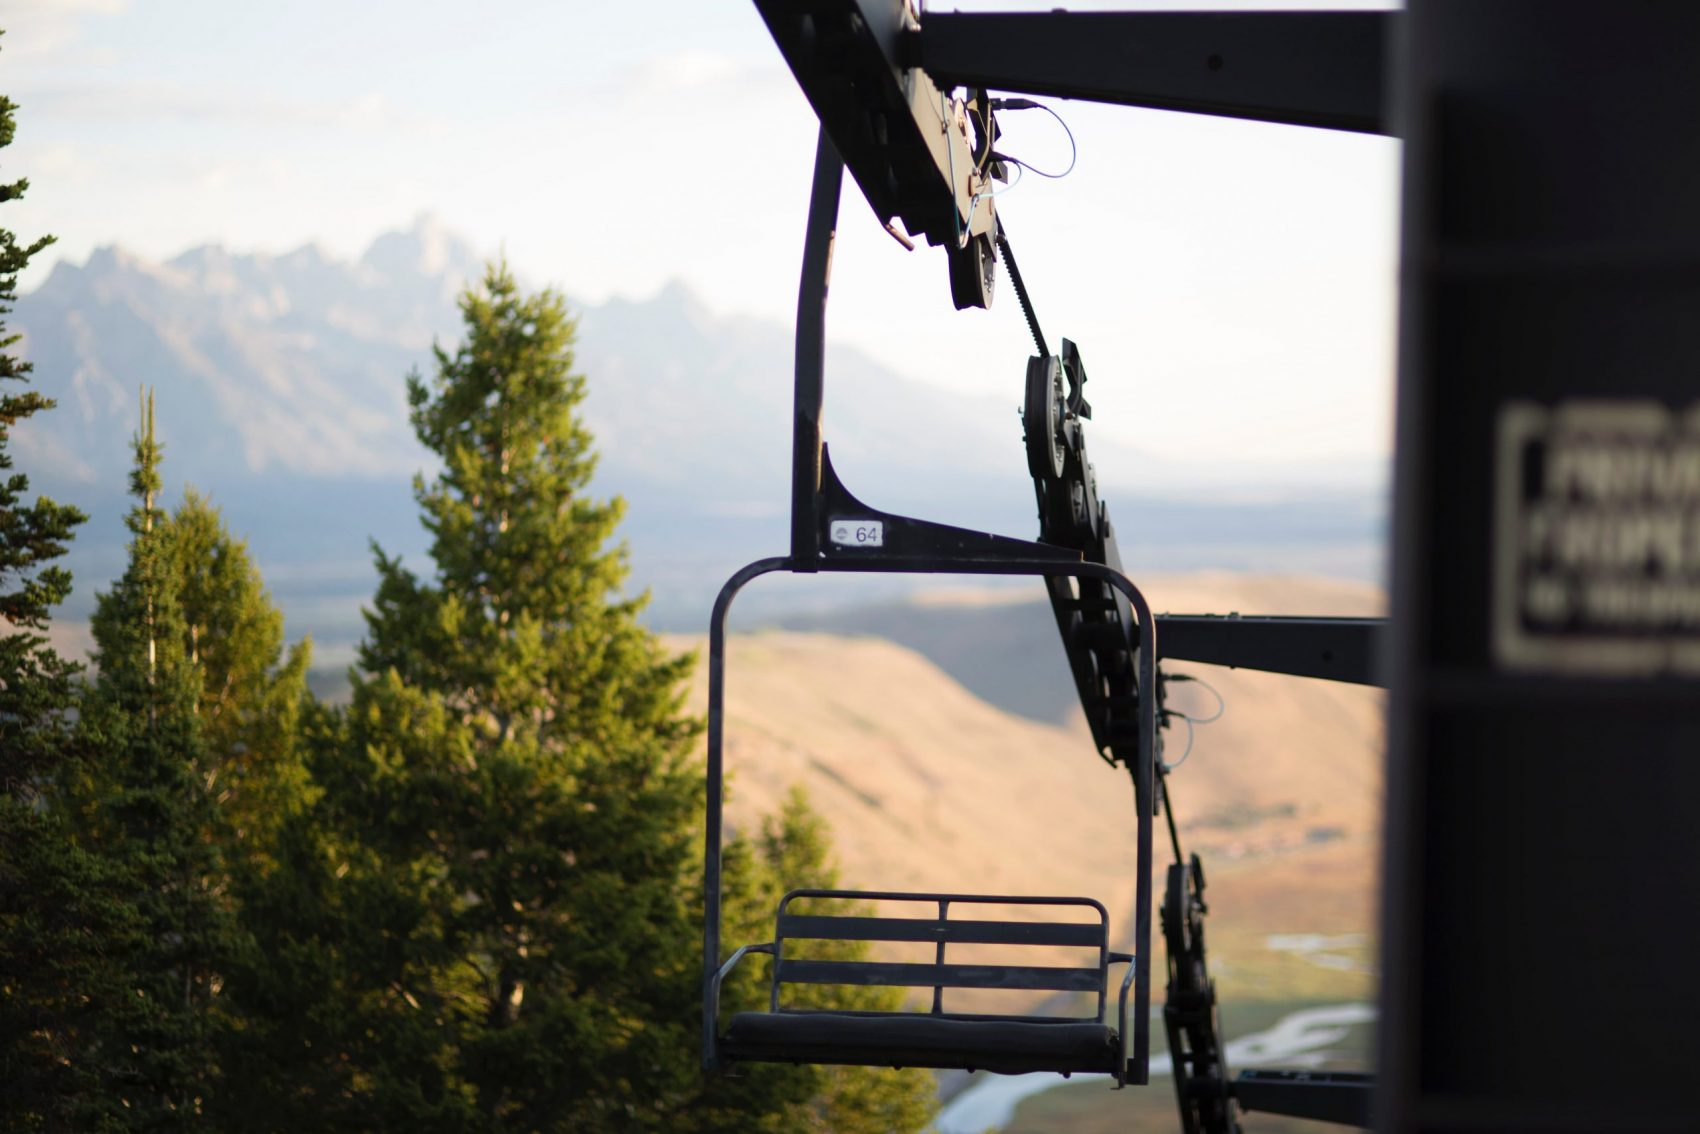 snow king, wyoming, Jackson, summit lift